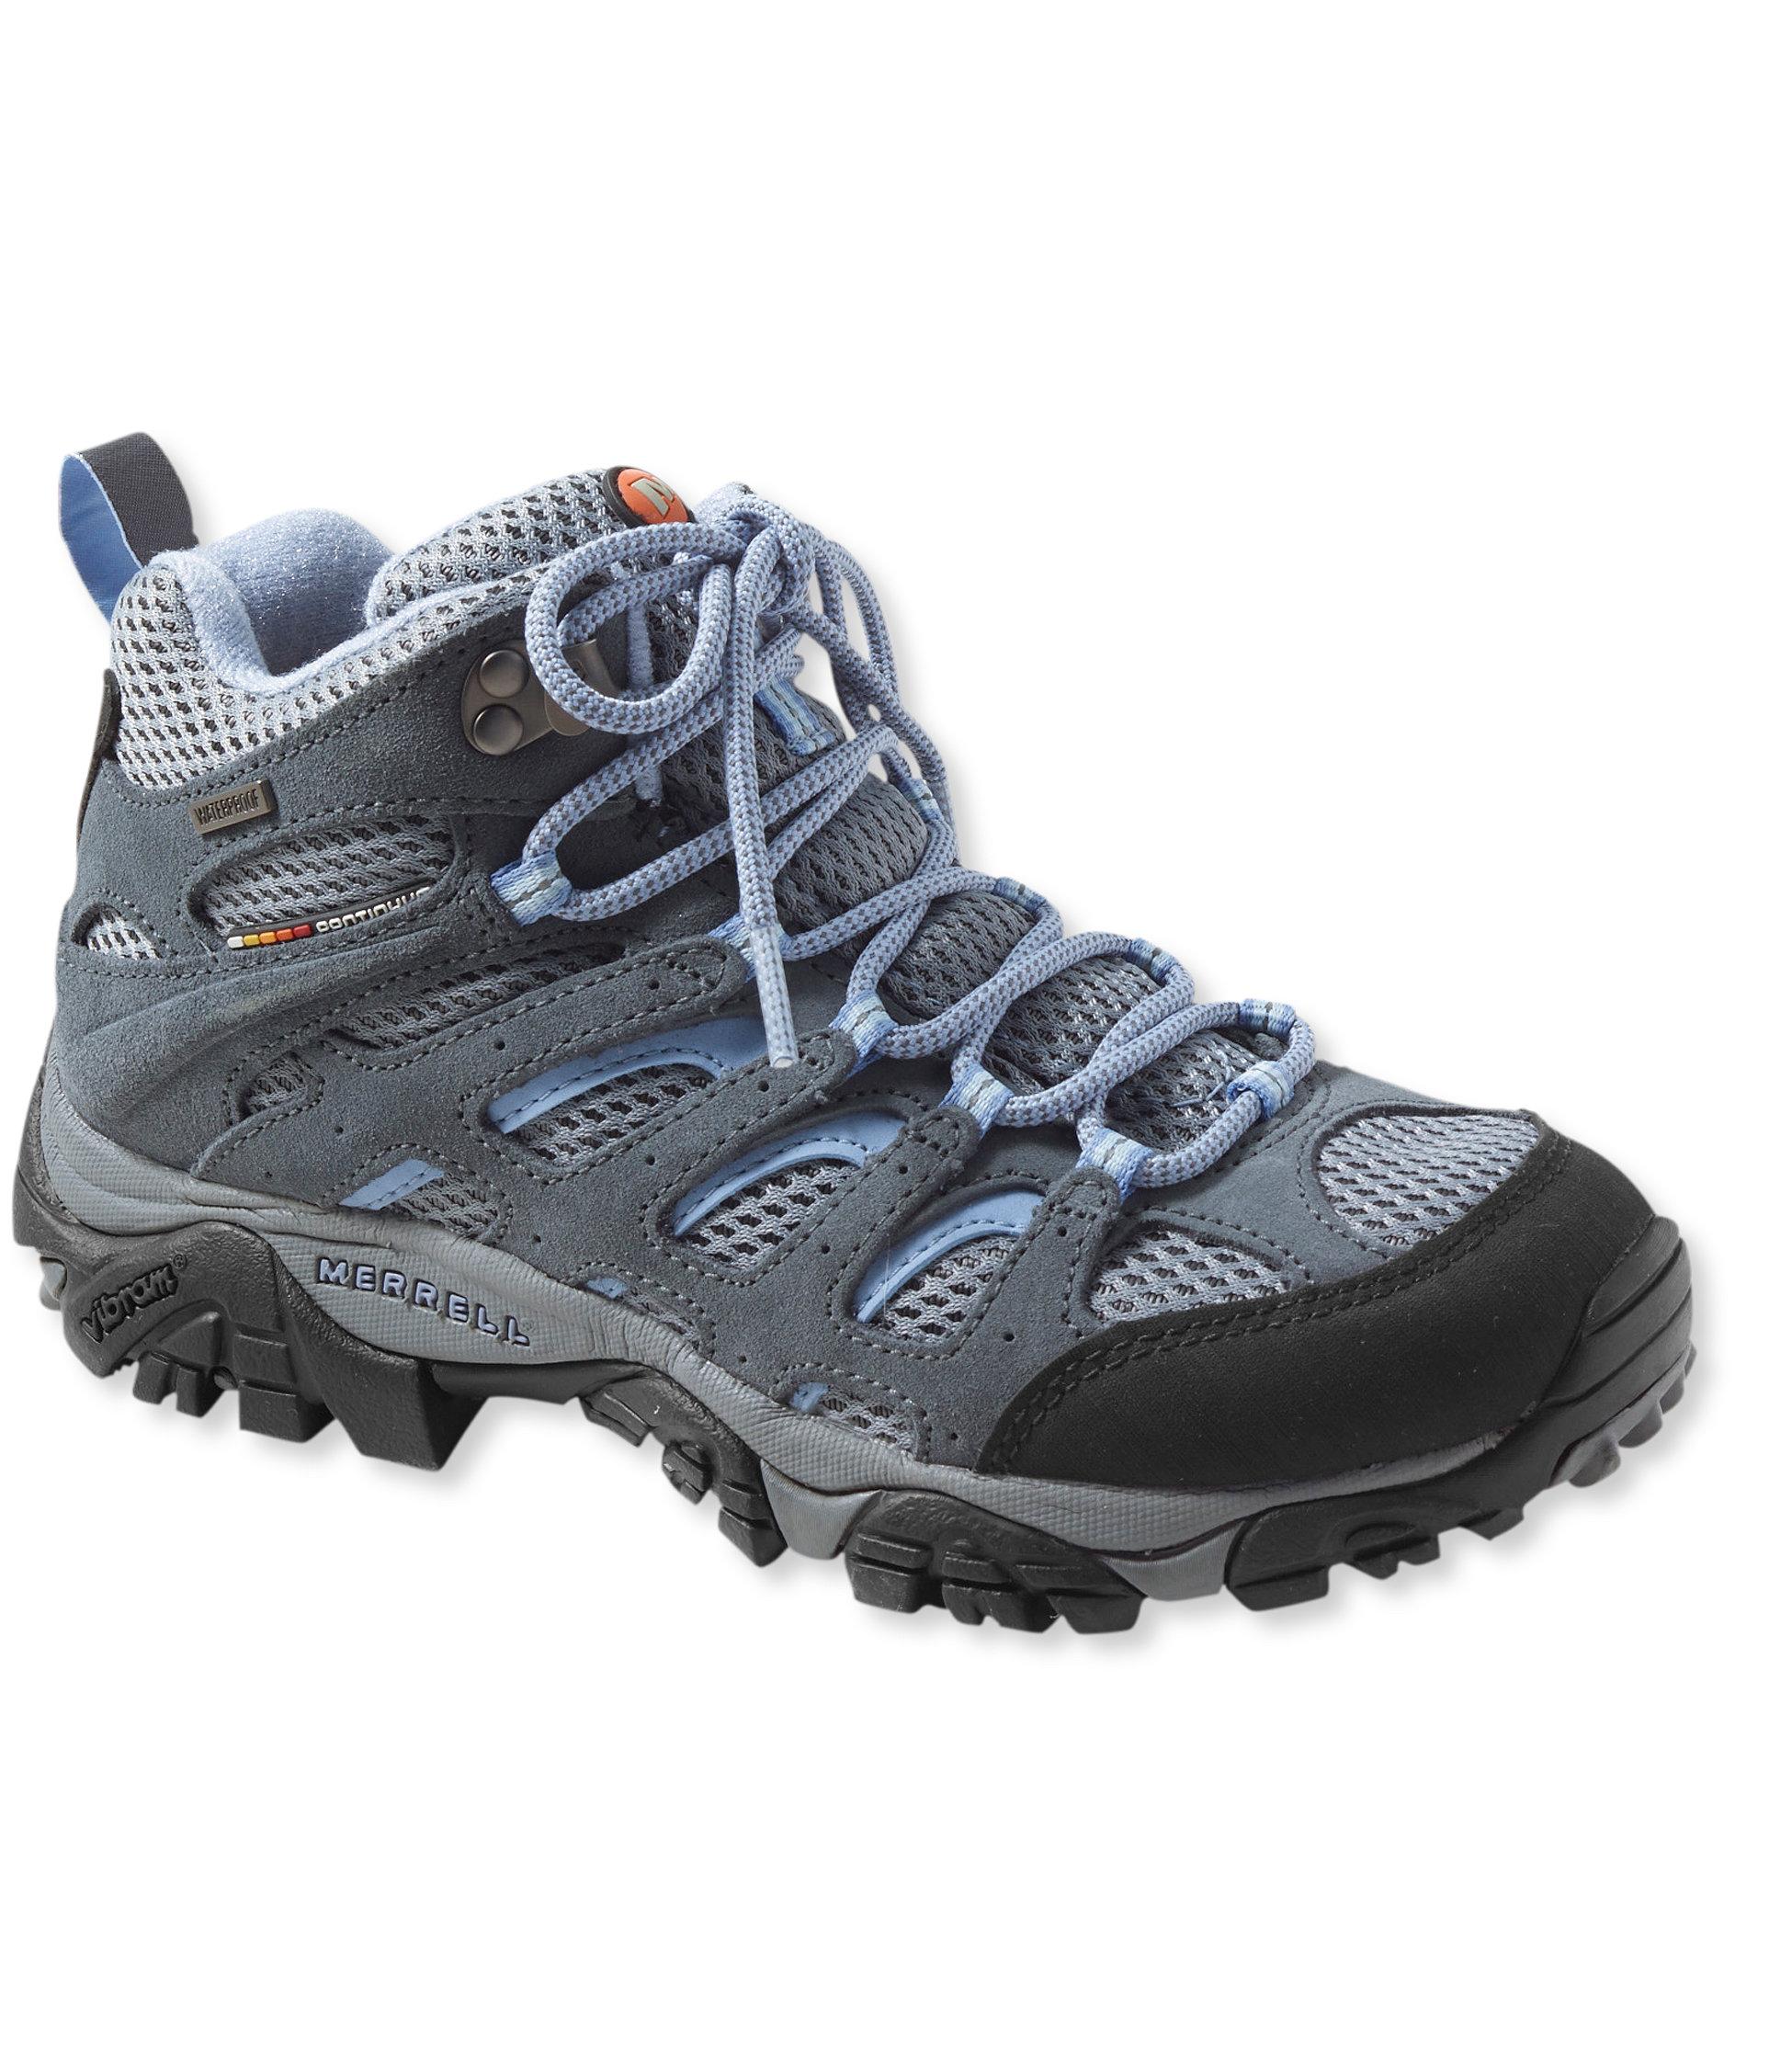 photo: Merrell Women's Moab Mid Waterproof hiking boot